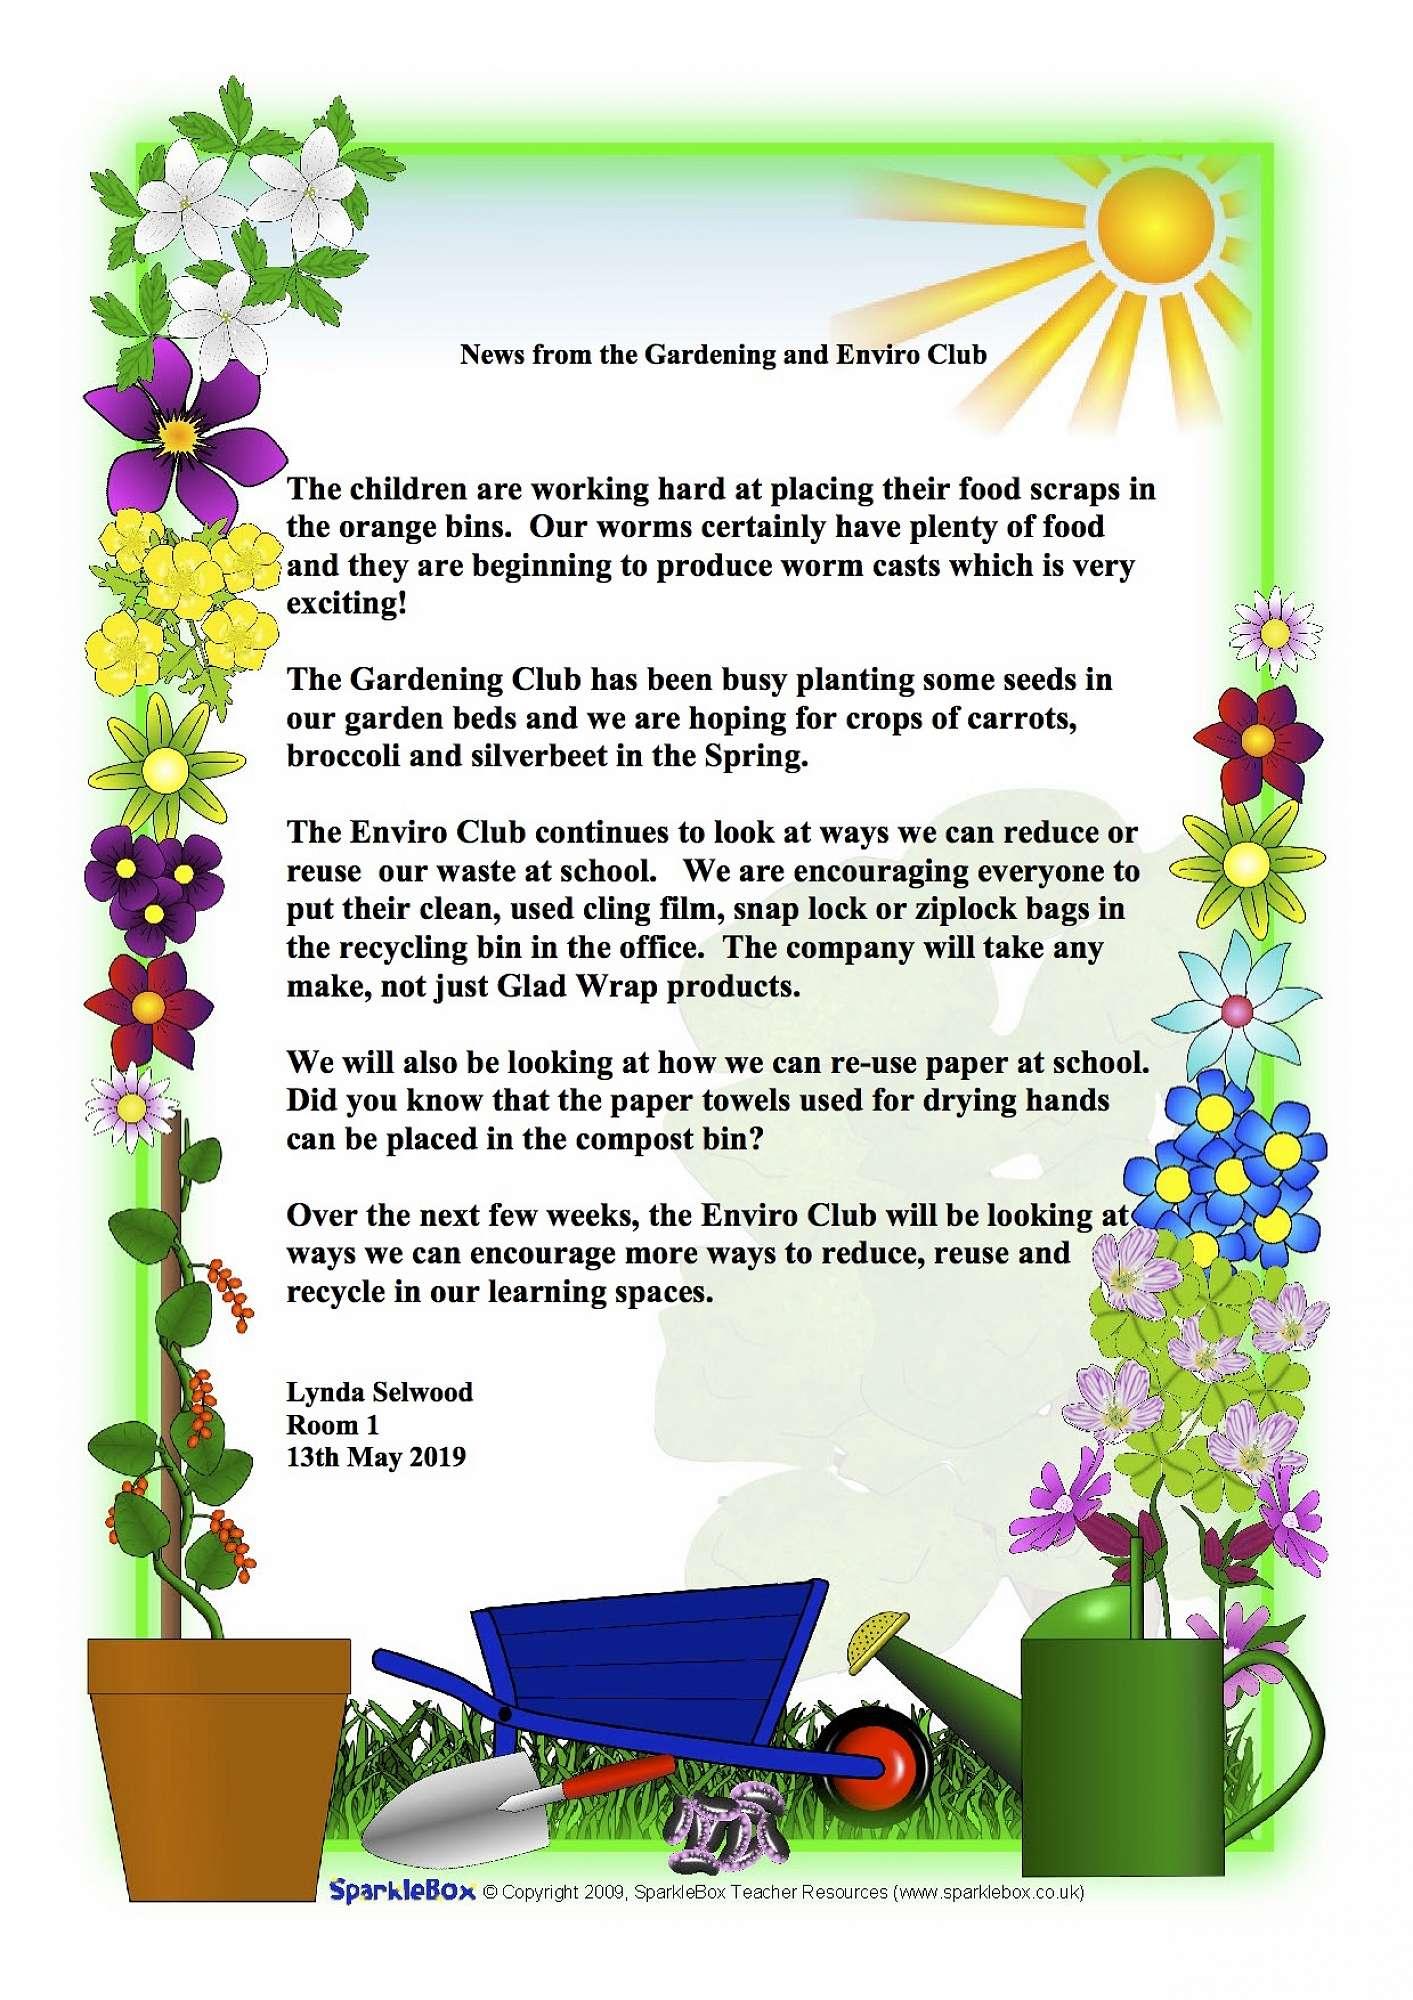 Garden Club and Enviro Club update